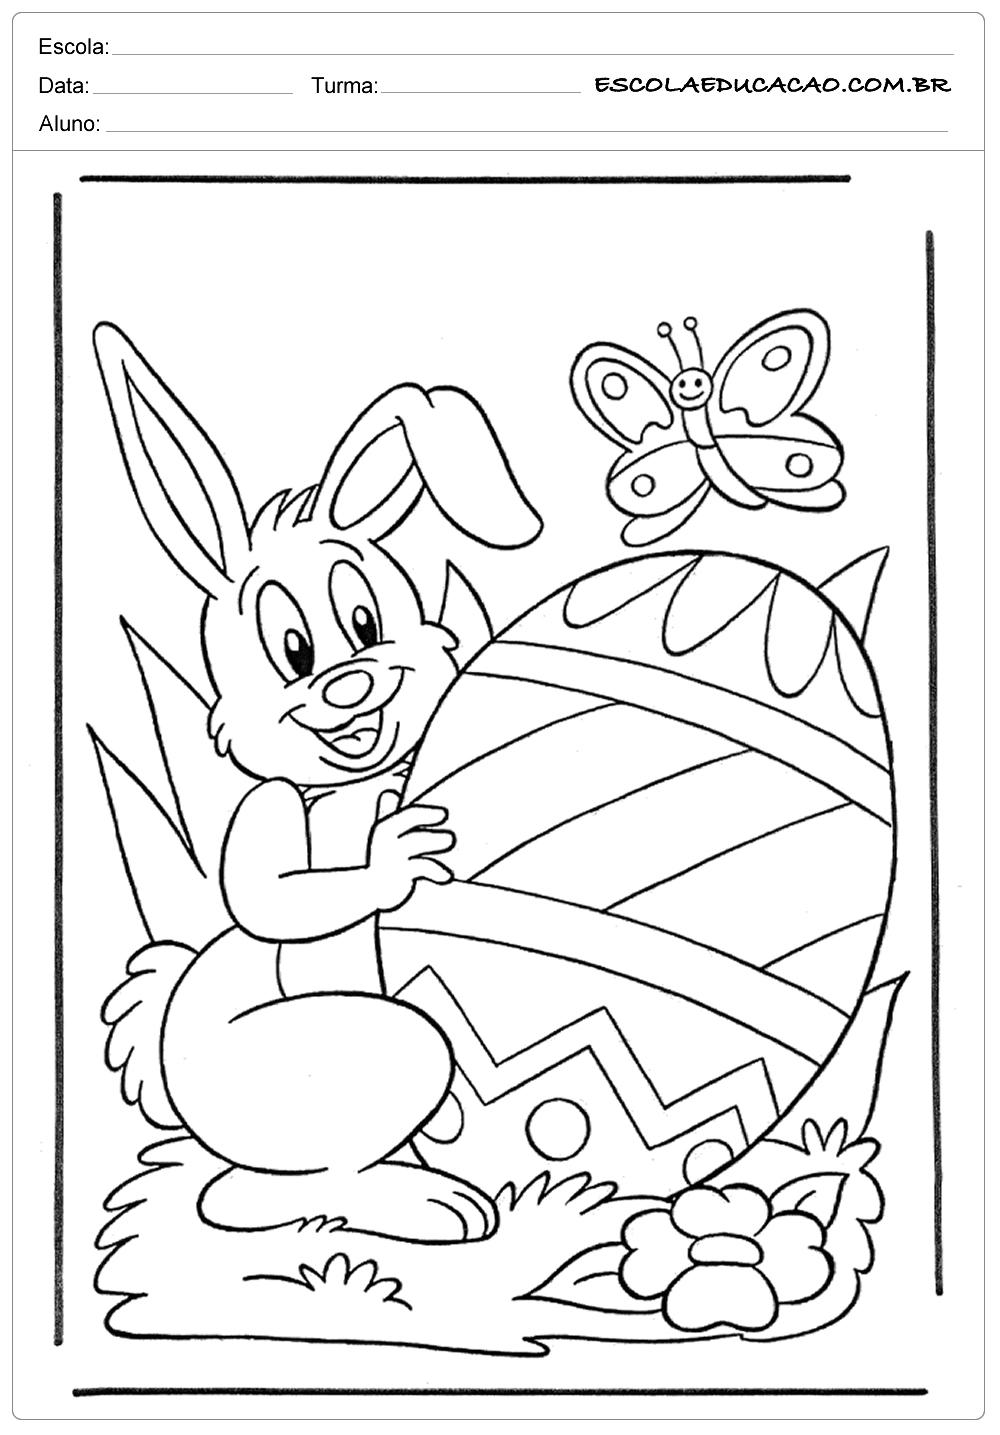 Desenhos Da Pascoa Para Colorir Coelho E Borboleta Escola Educacao